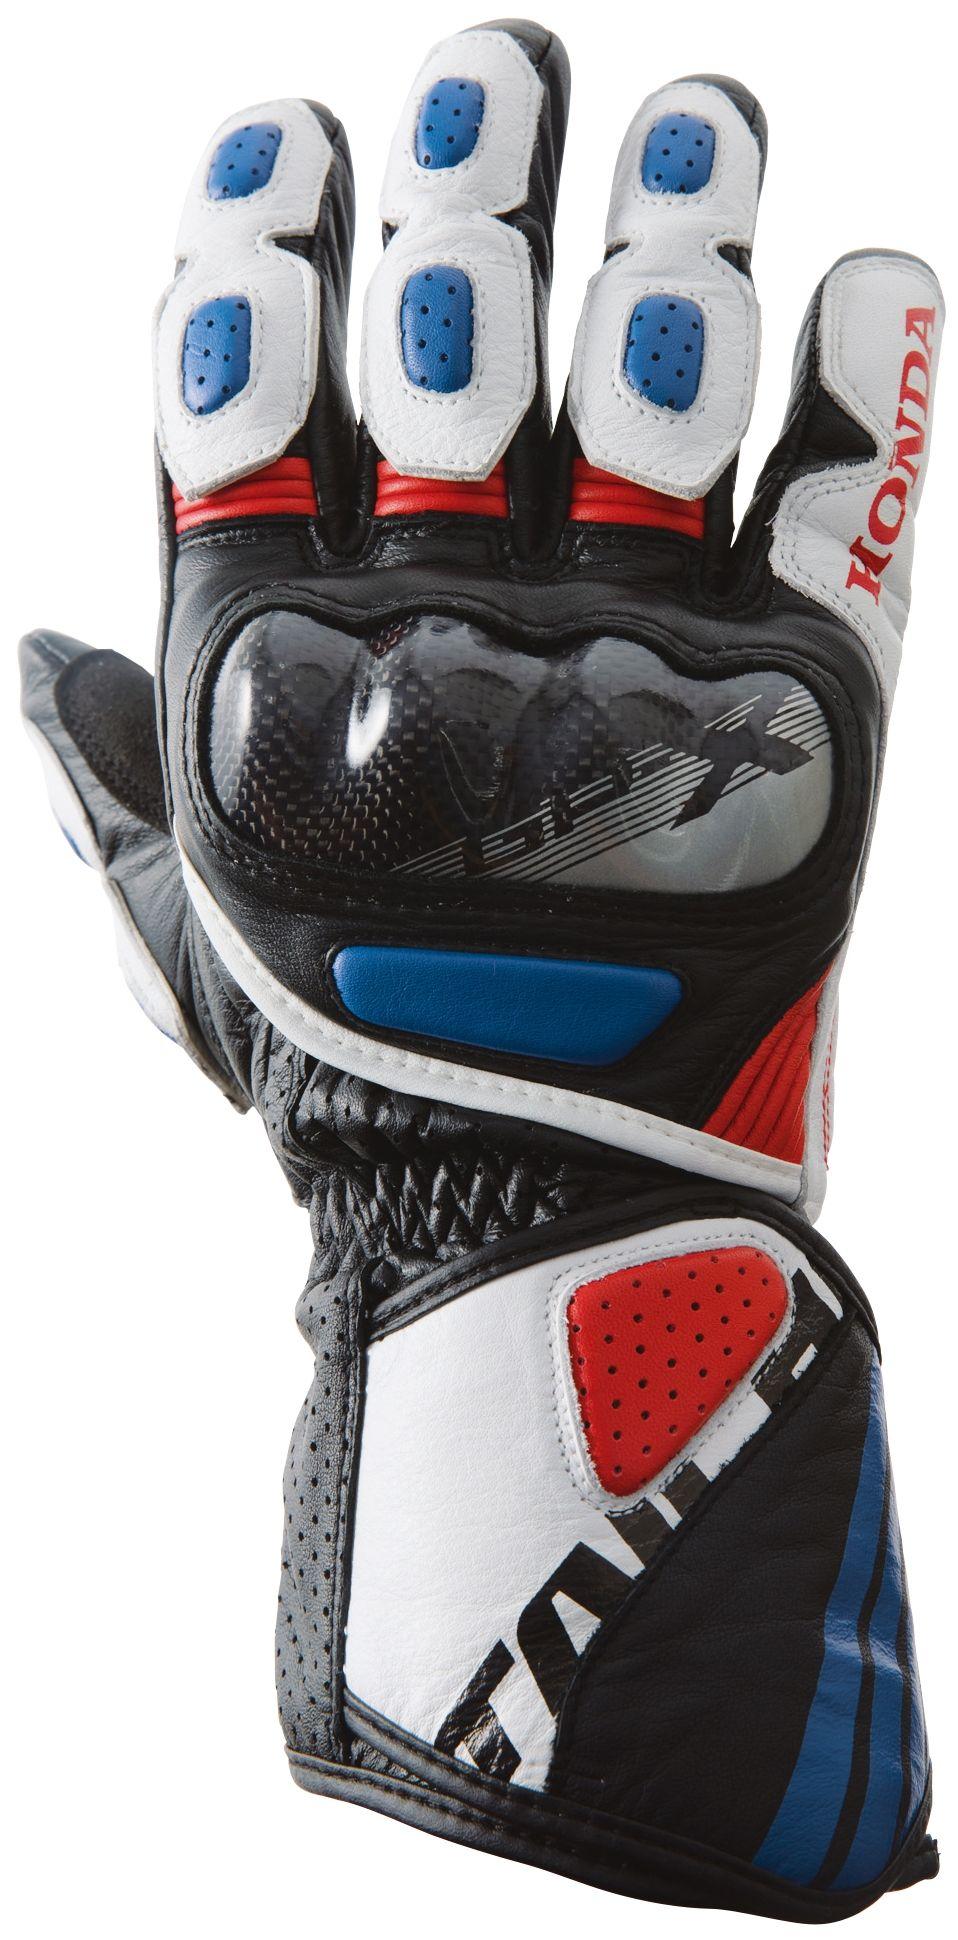 GP-X RACING Gloves